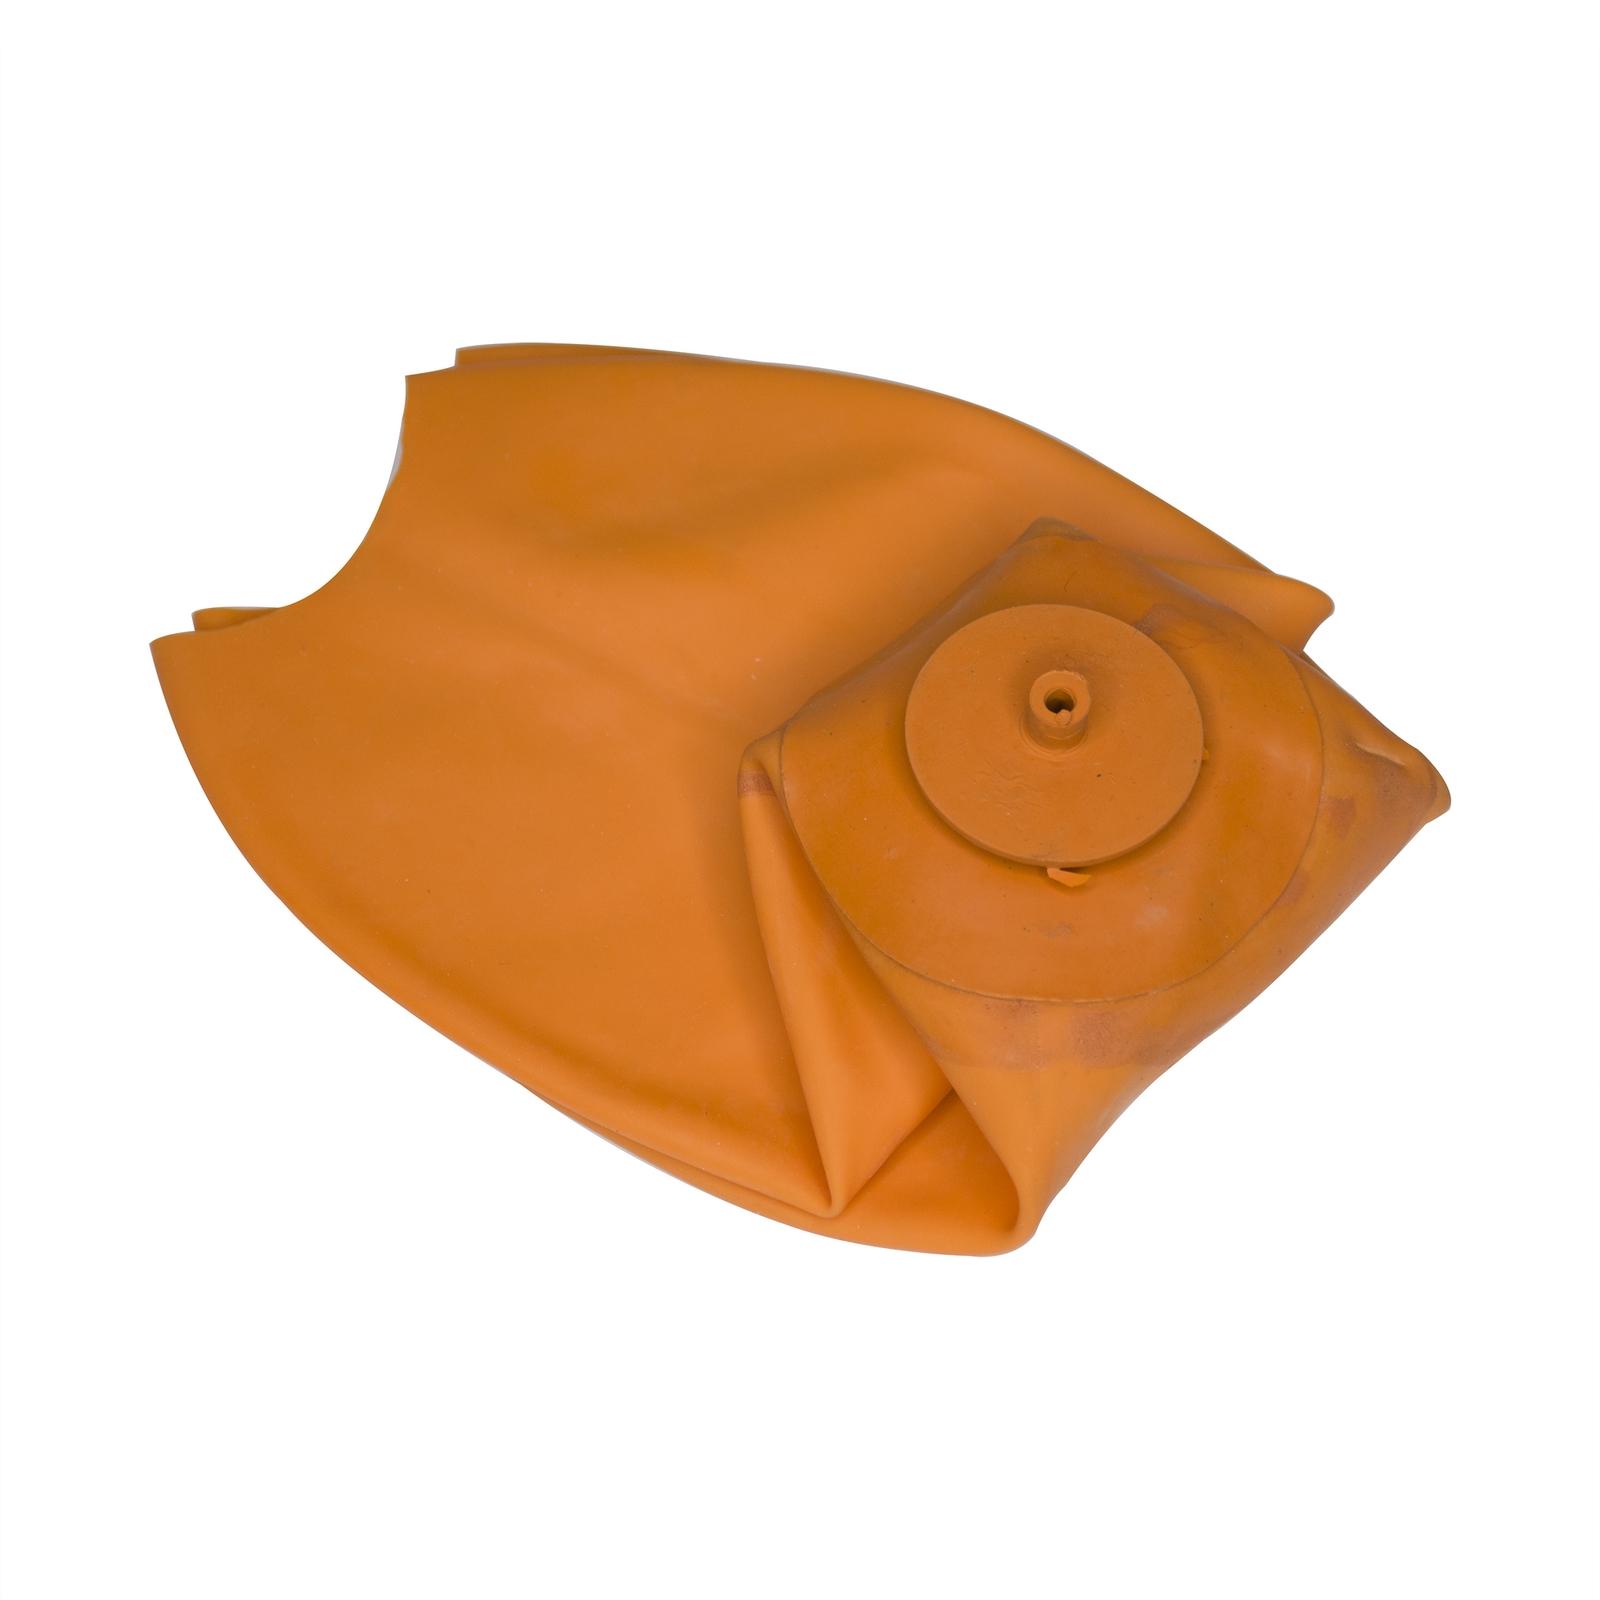 Spare Bladder For Lung Demo Model